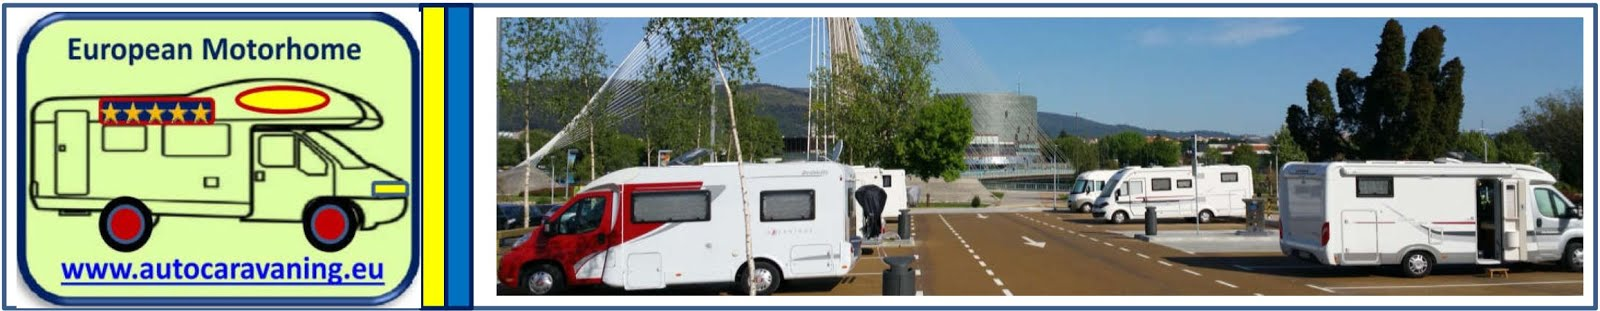 European Motorcaravanning